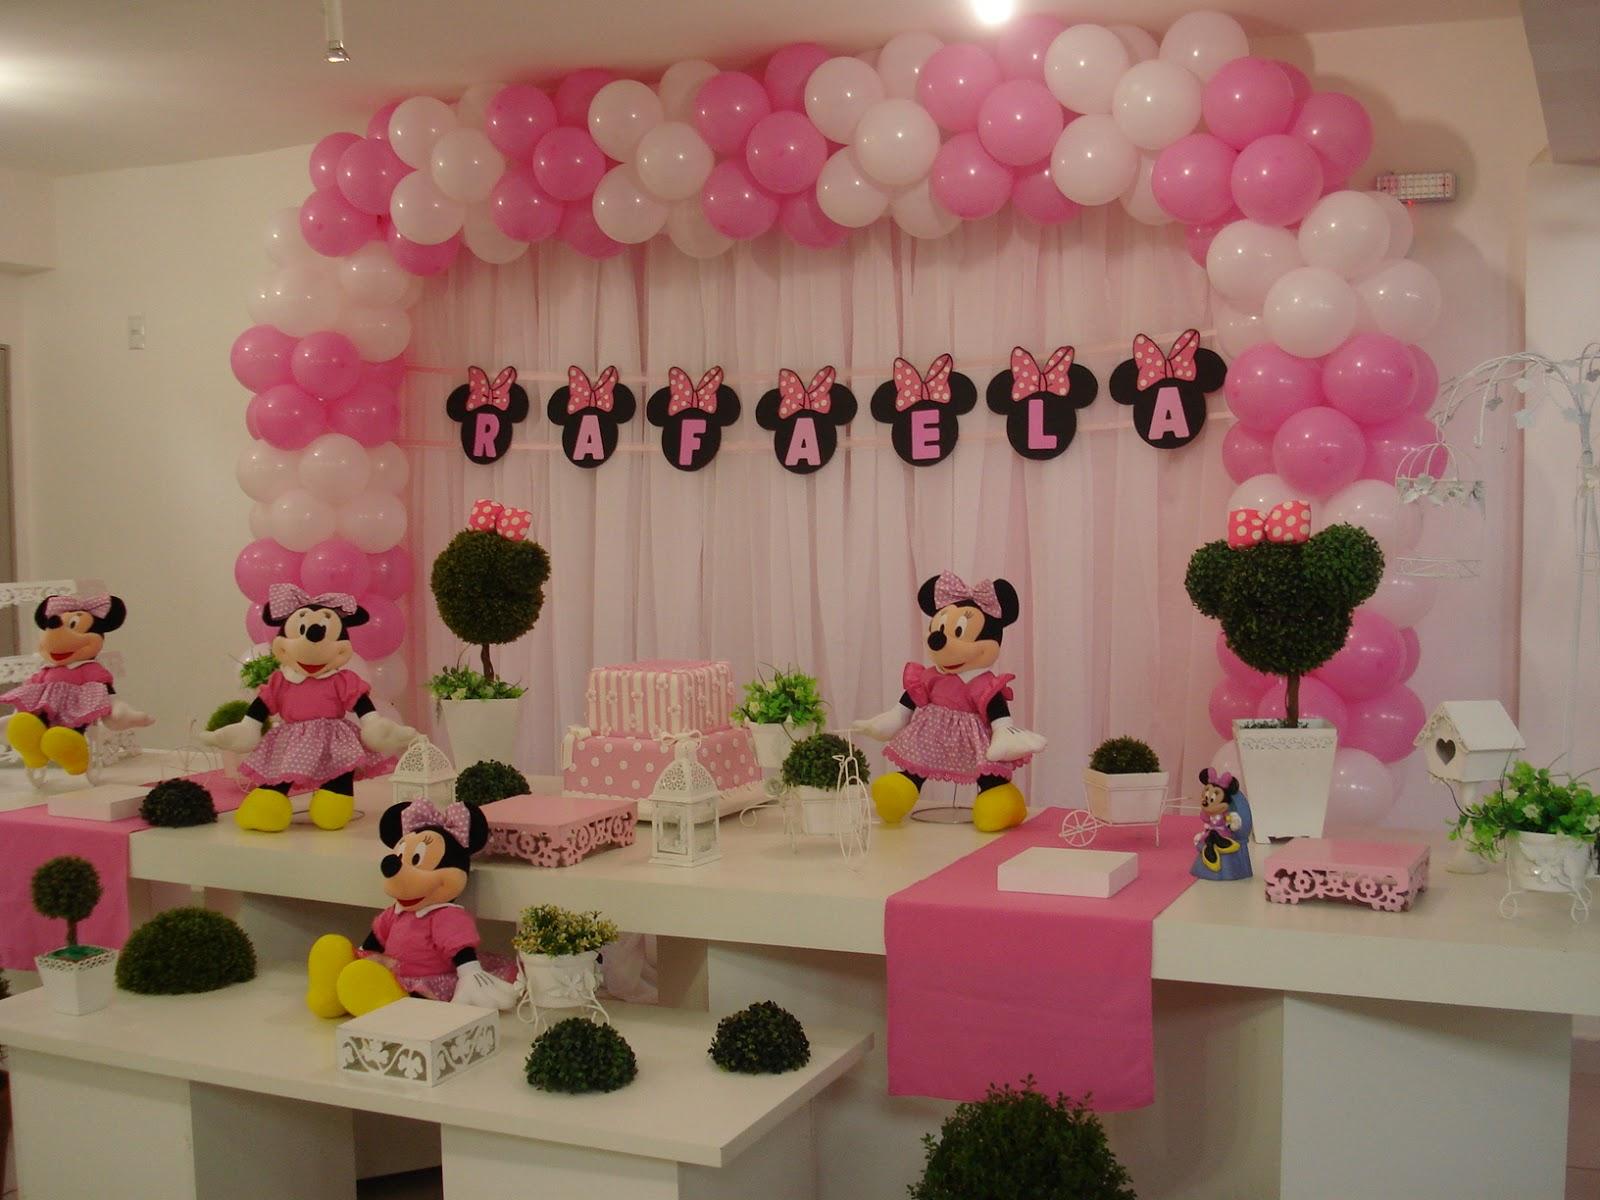 decoracao festa minnie rosa : decoracao festa minnie rosa:Decoracao De Festa Infantil Da Minnie